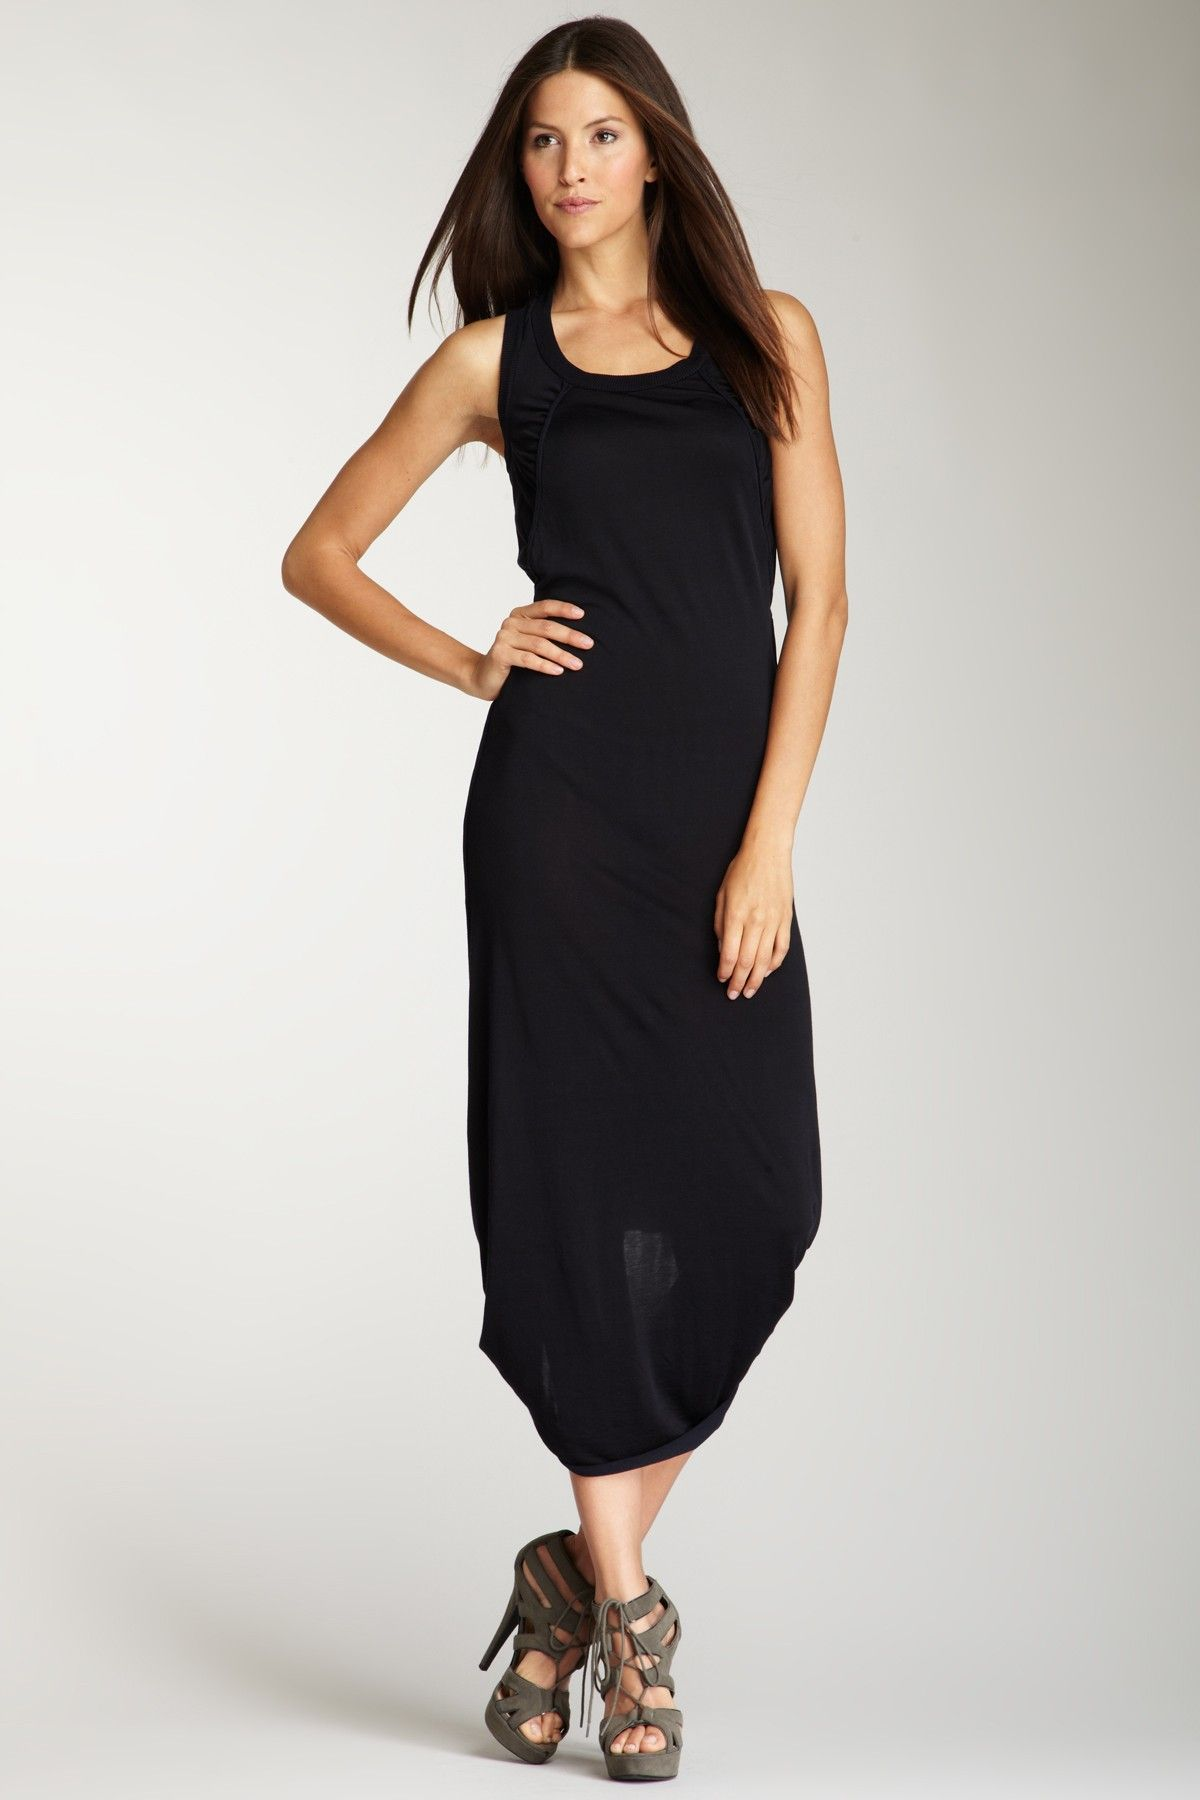 Tt Collection  Ttee Naomi Dress  $ 81.00